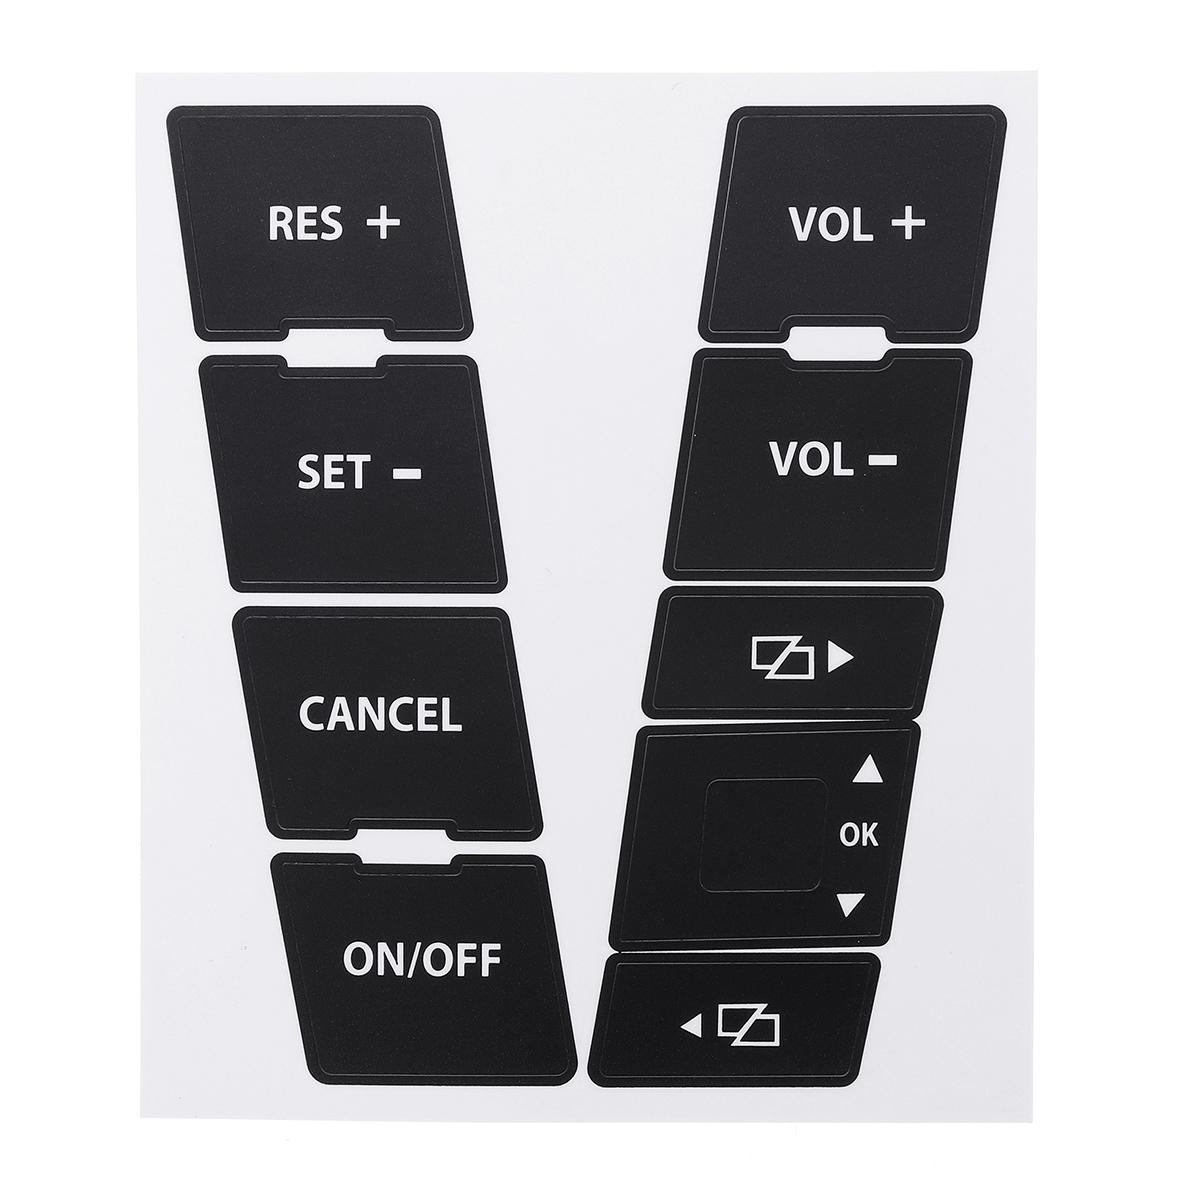 Audi A6 4B 01-05 CLIMATE TEMPERATURE CONTROL peeling worn buttons button repair